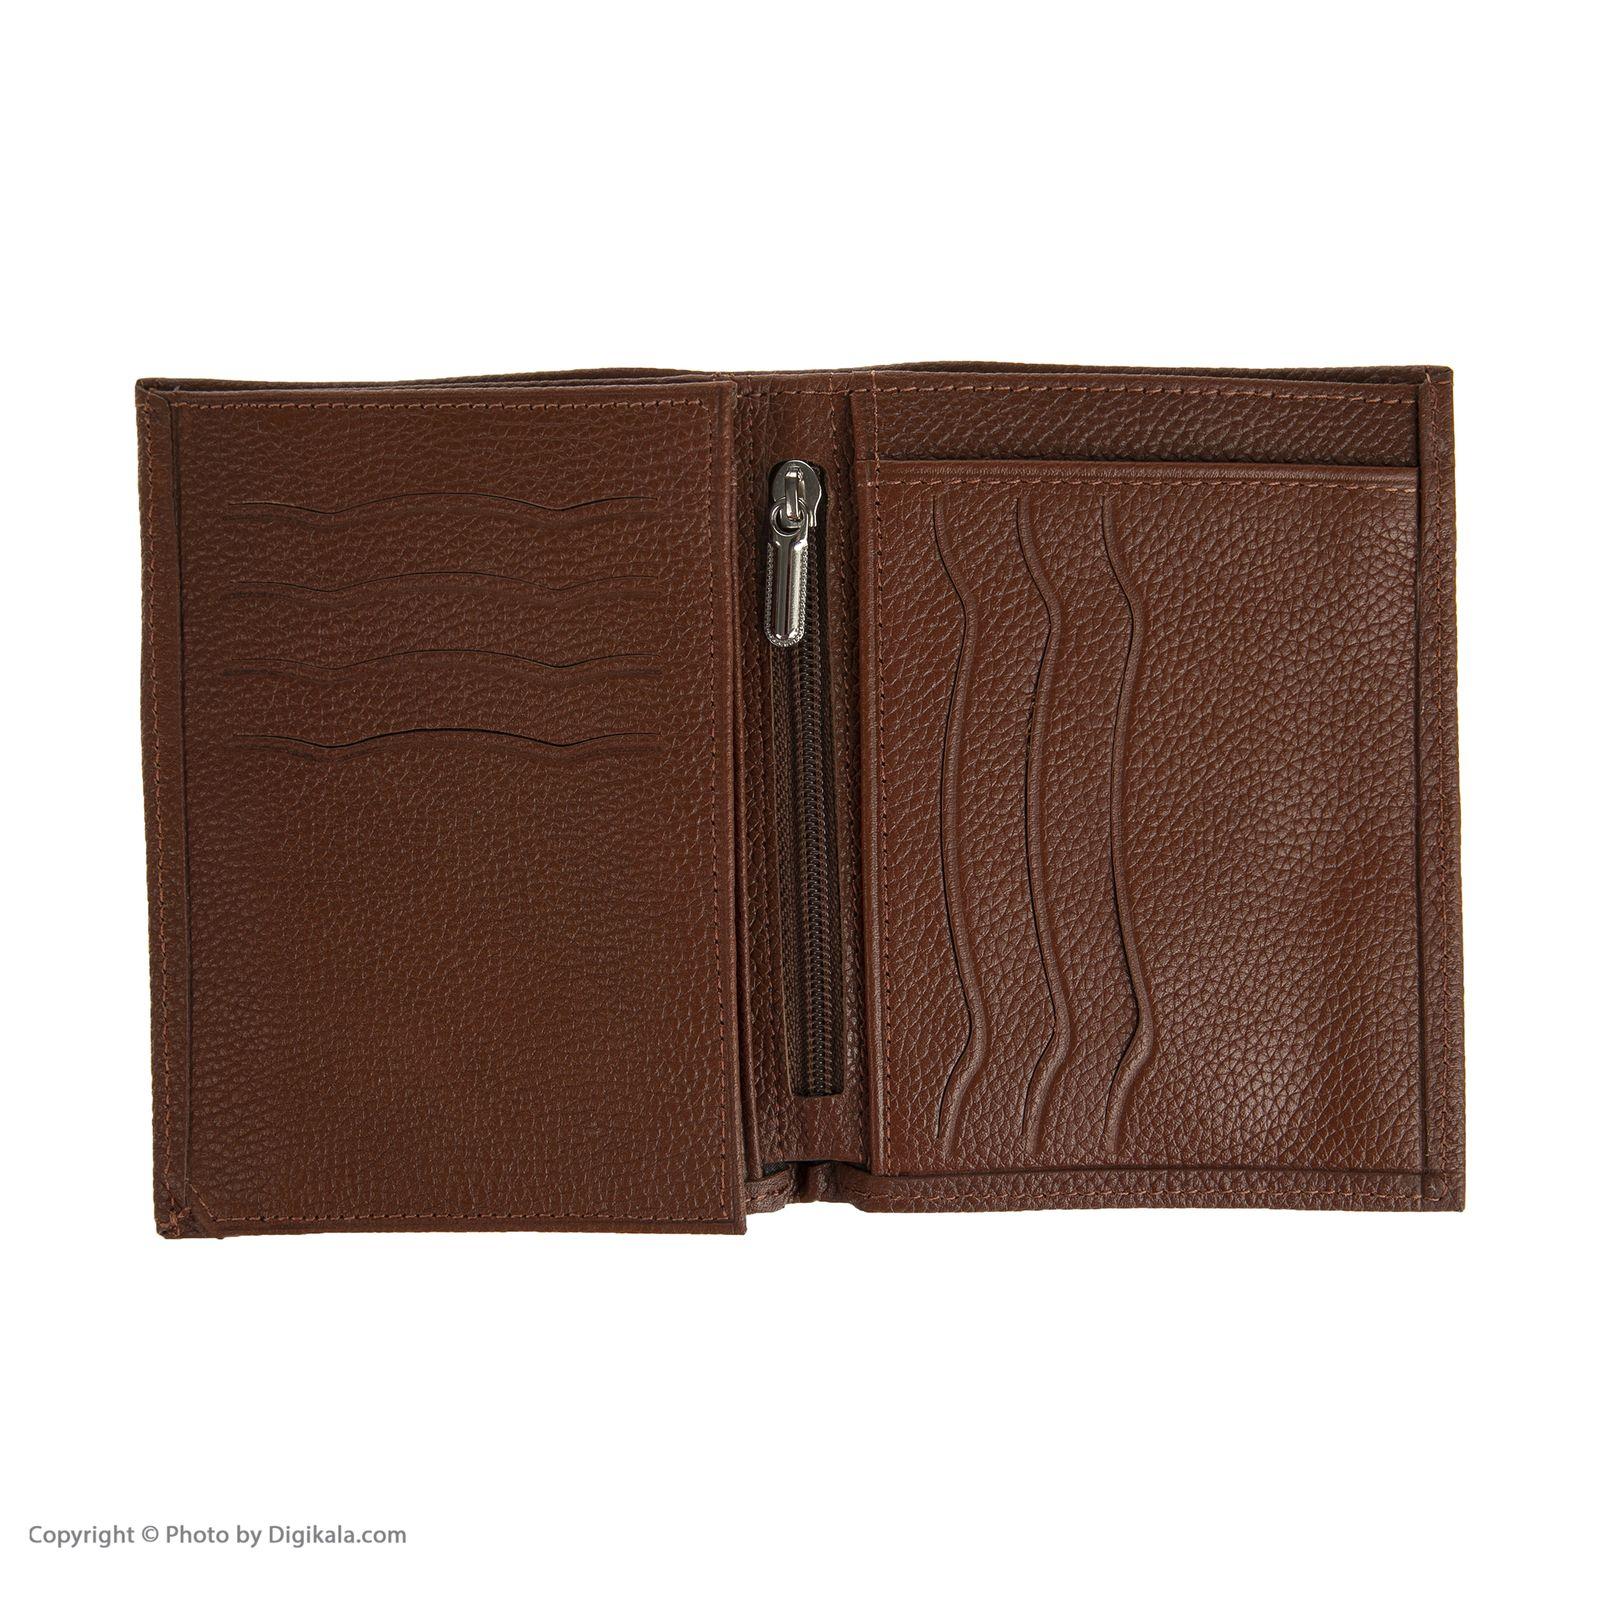 کیف پول مردانه چرمیران مدل 6057104 -  - 5